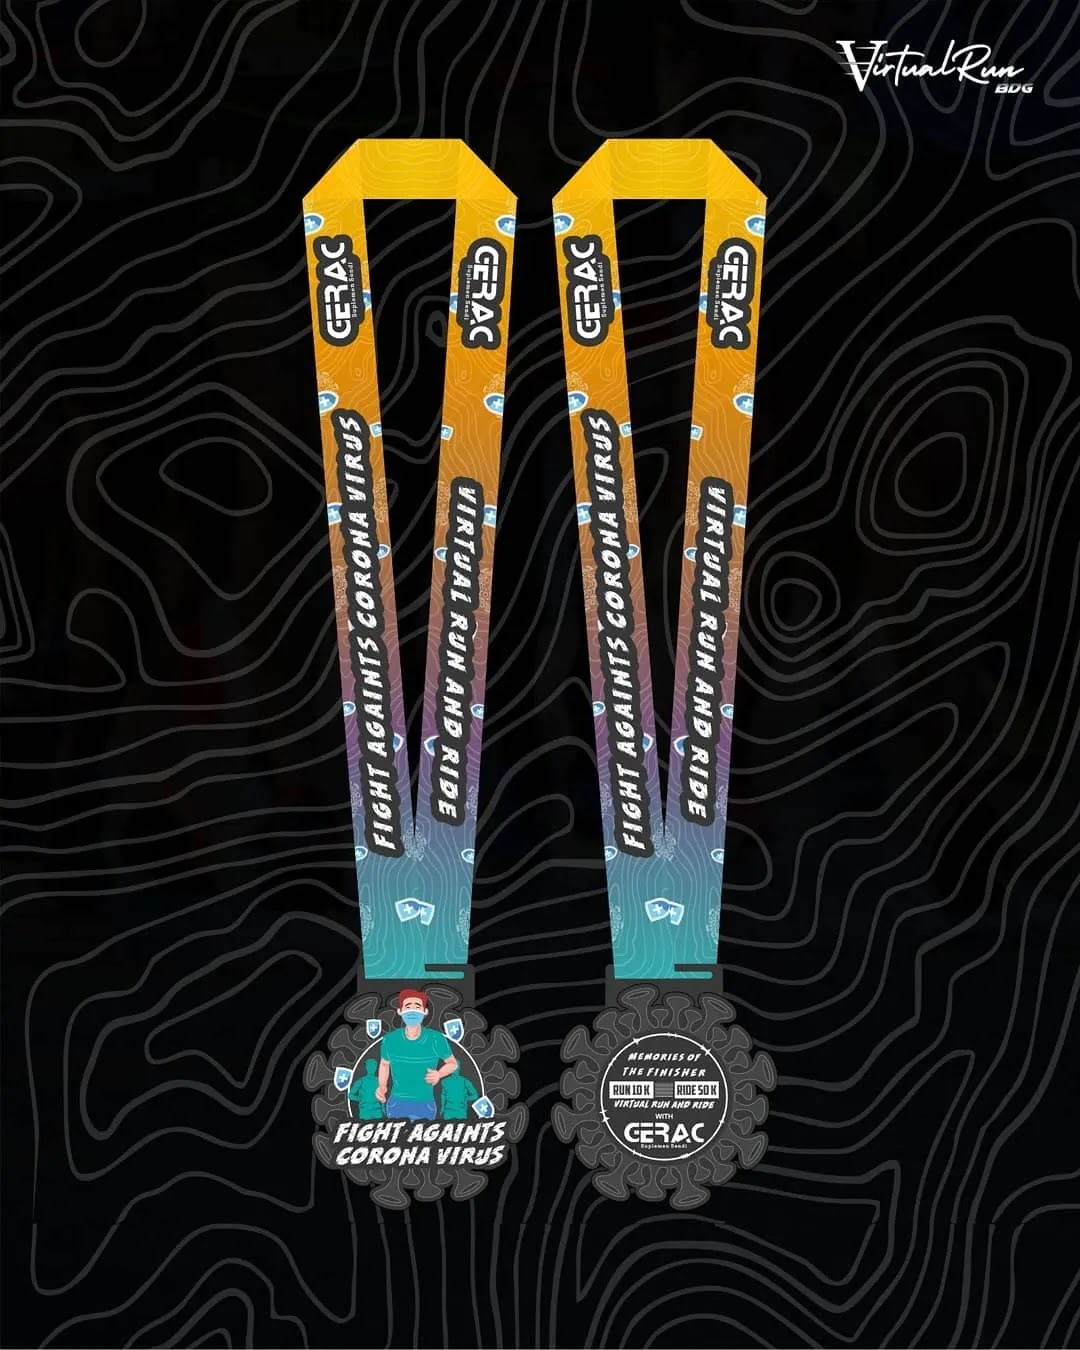 Medali � Virtual Run & Ride GERAC • 2021